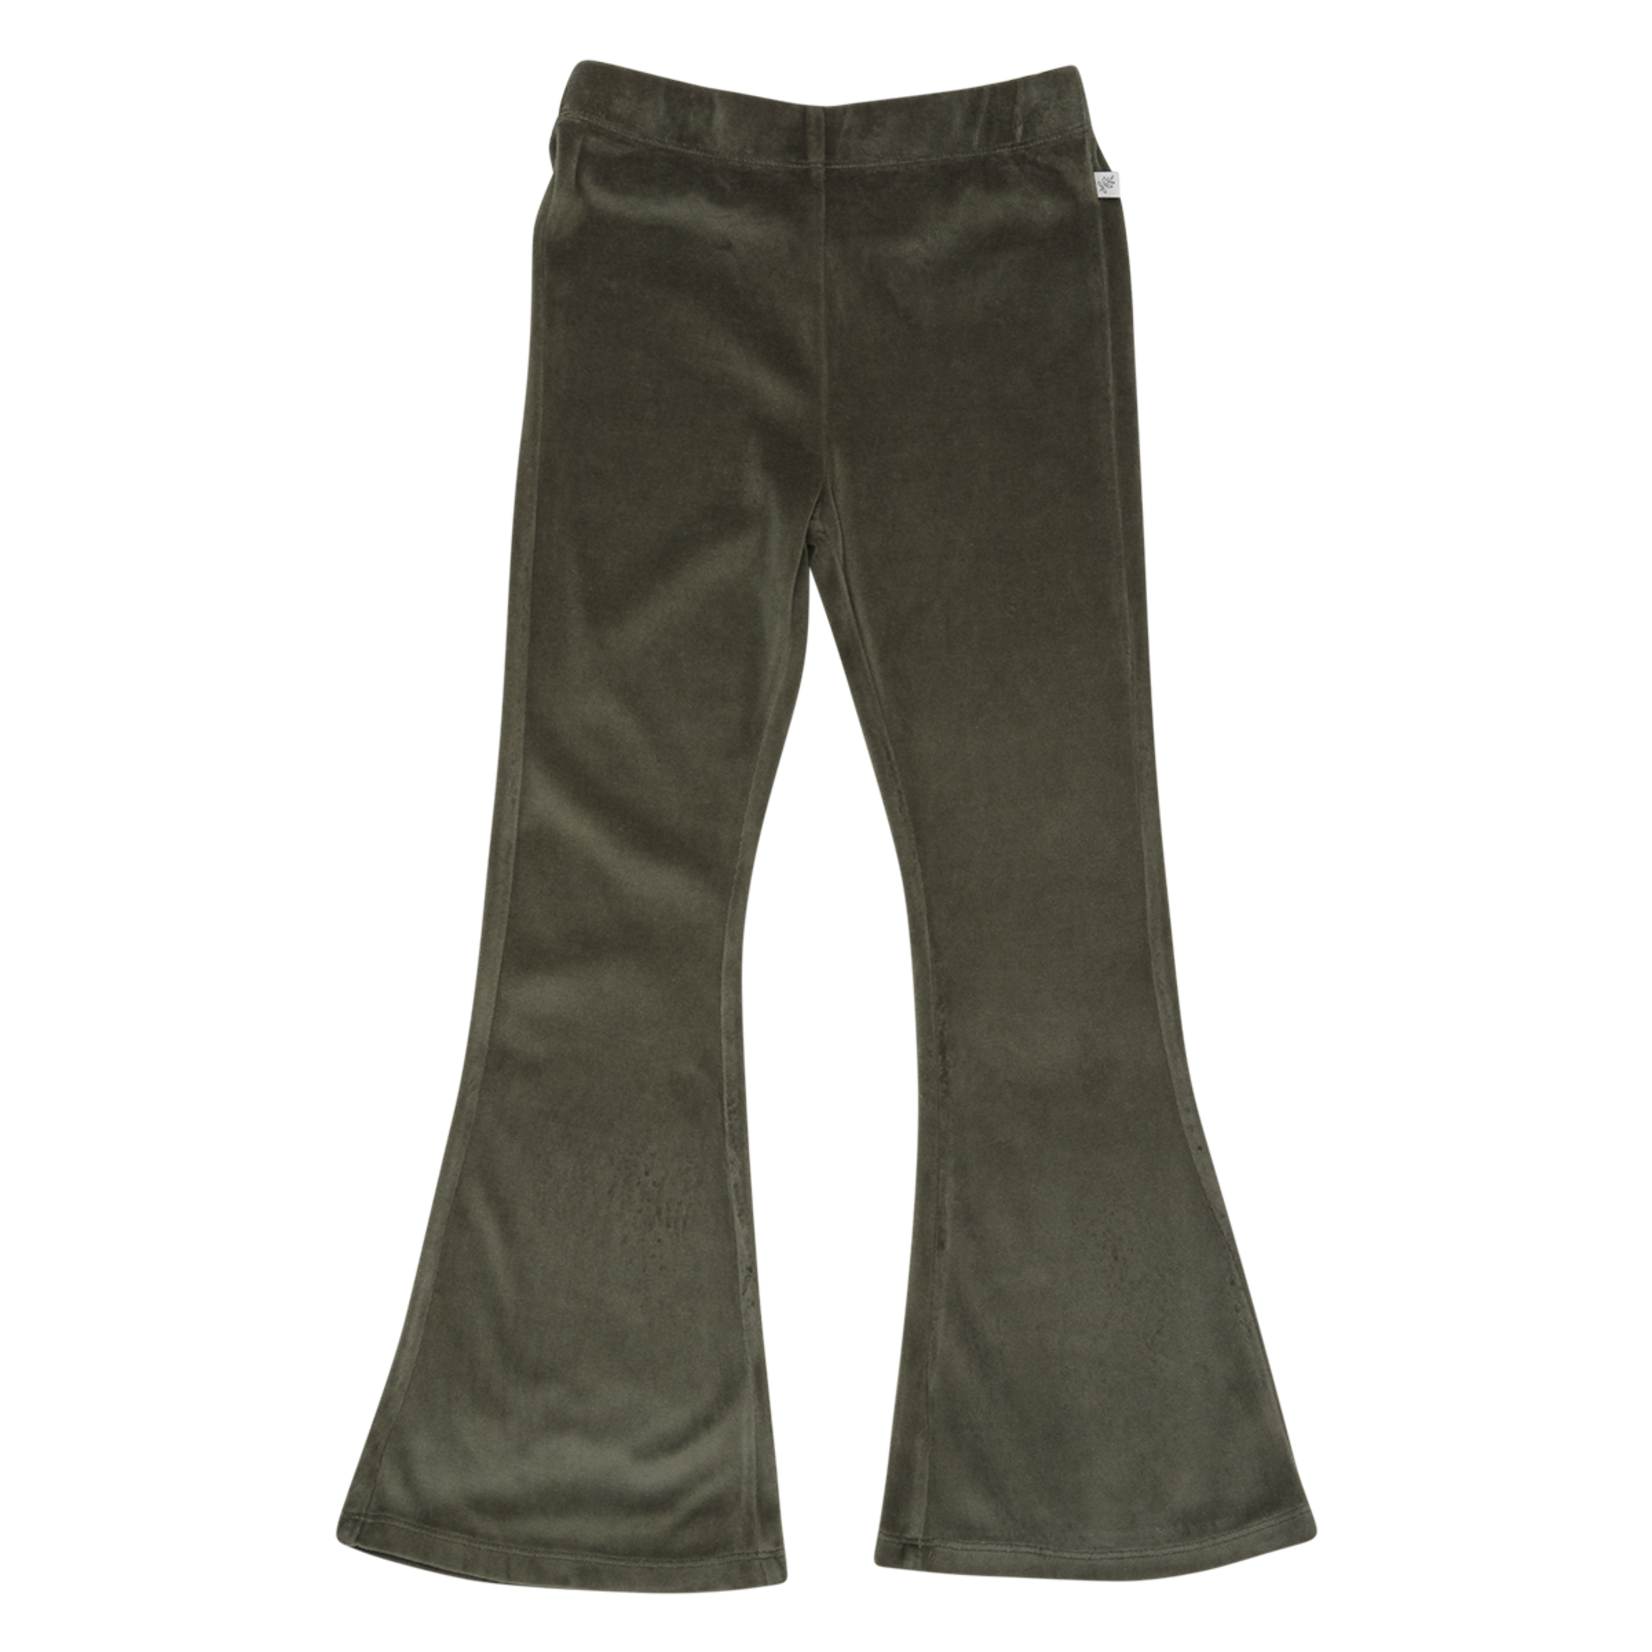 Blossom Kids BK - Flaired pants - Sage